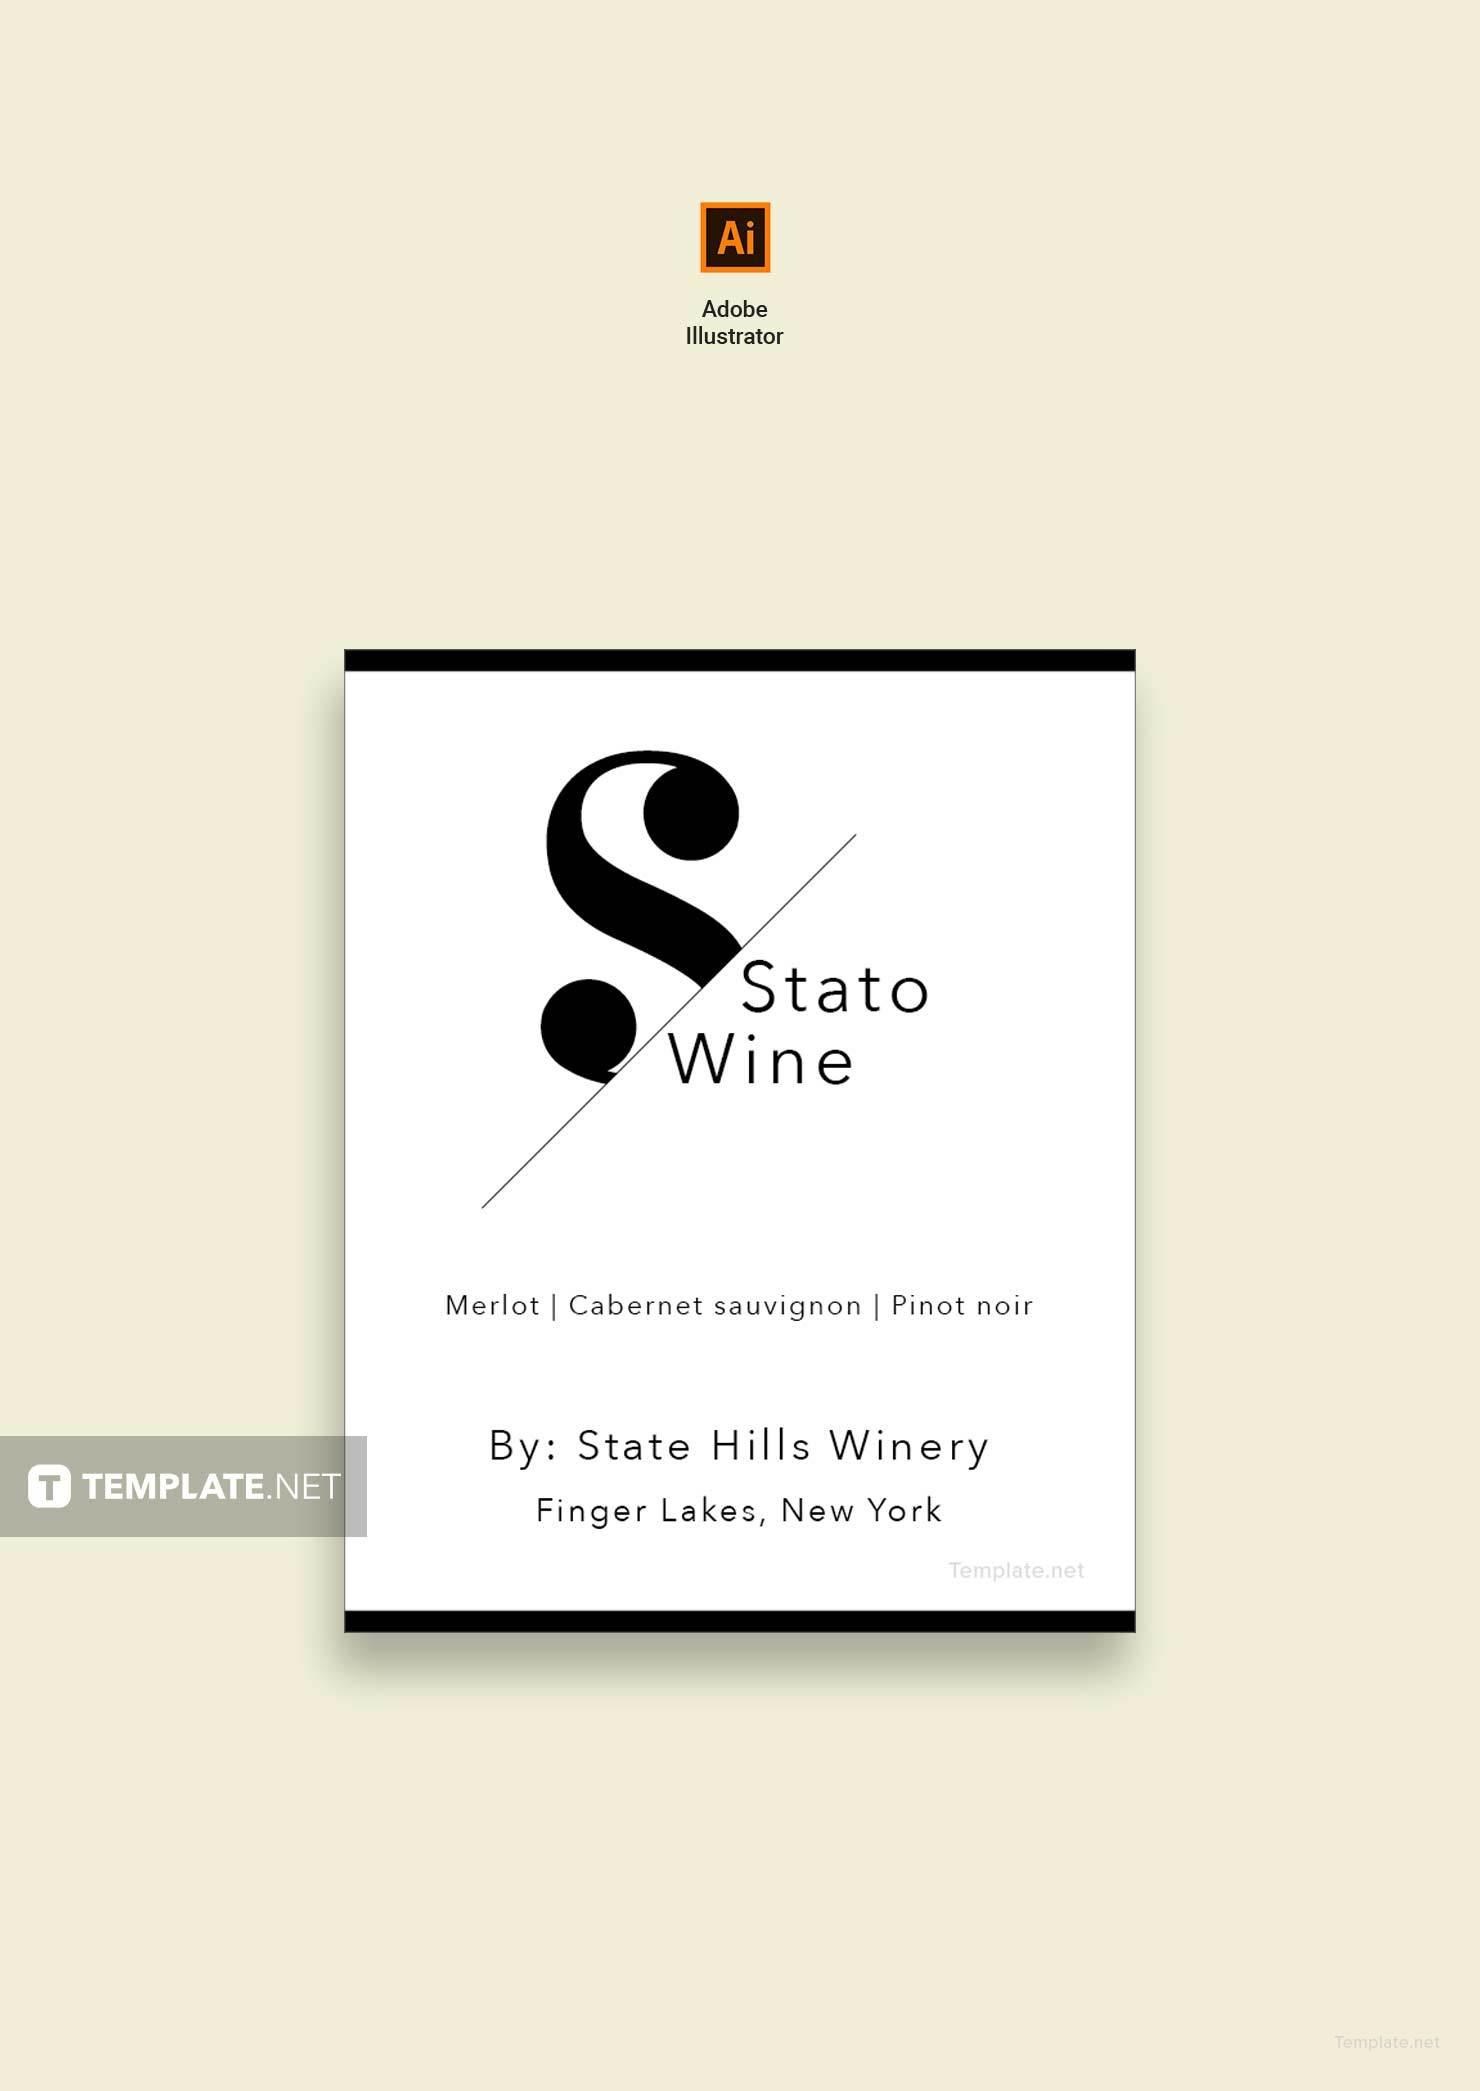 free mini wine label template adobe lllustrator. Black Bedroom Furniture Sets. Home Design Ideas